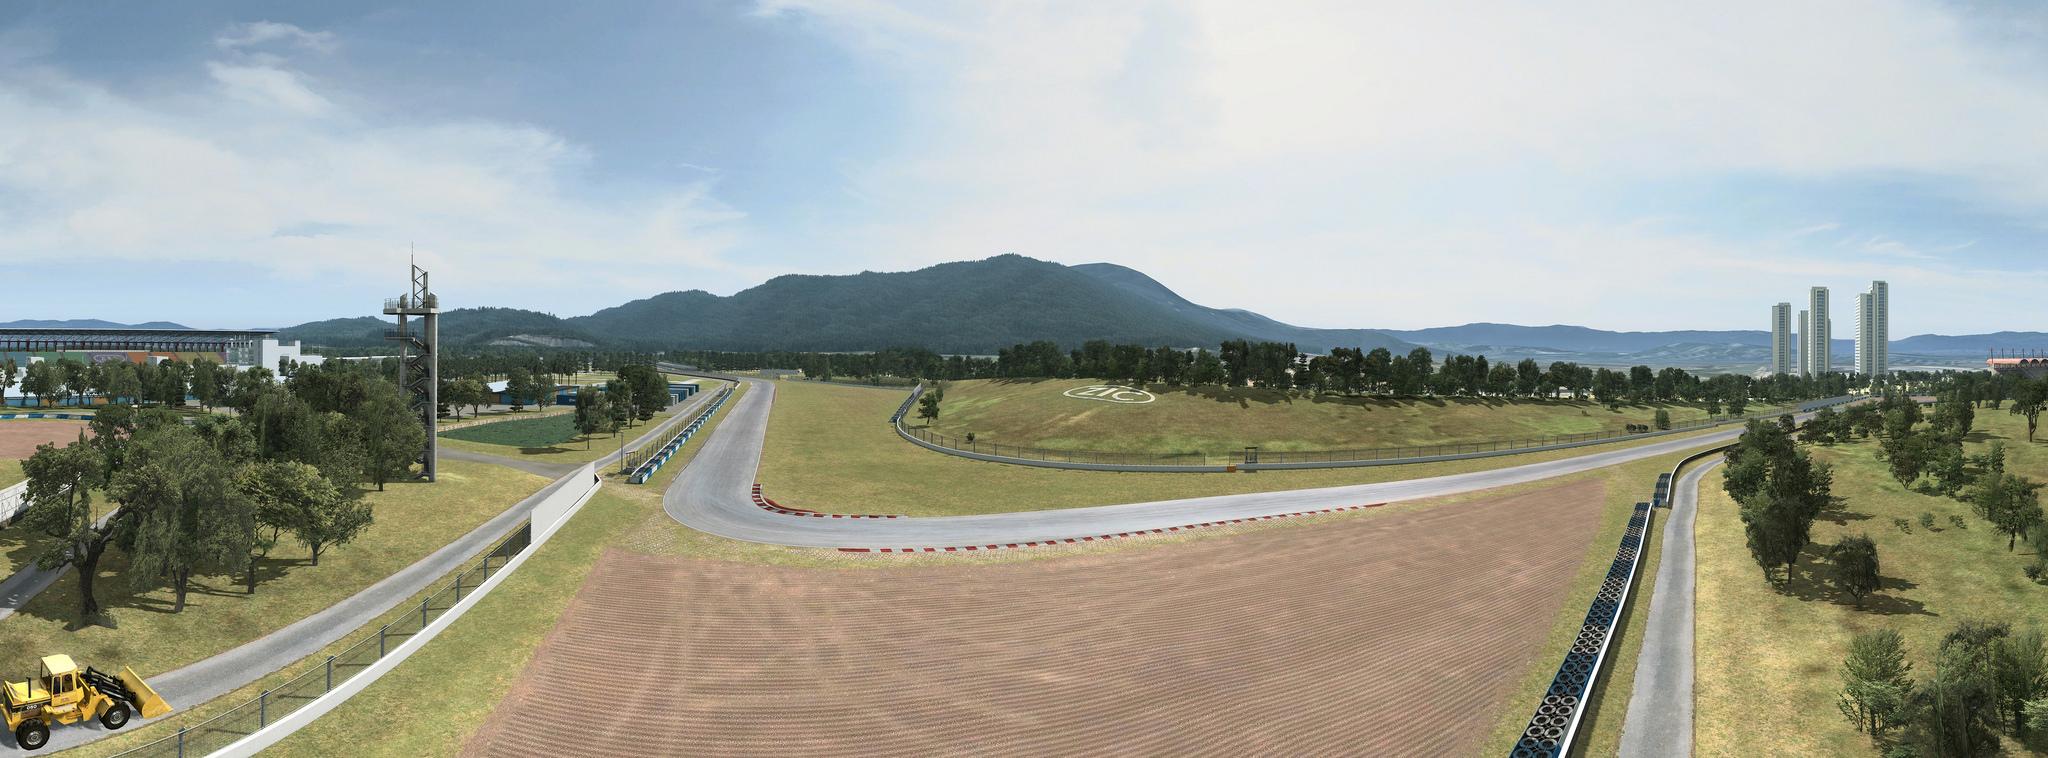 RaceRoom Zhuhai International Circuit 3.jpg